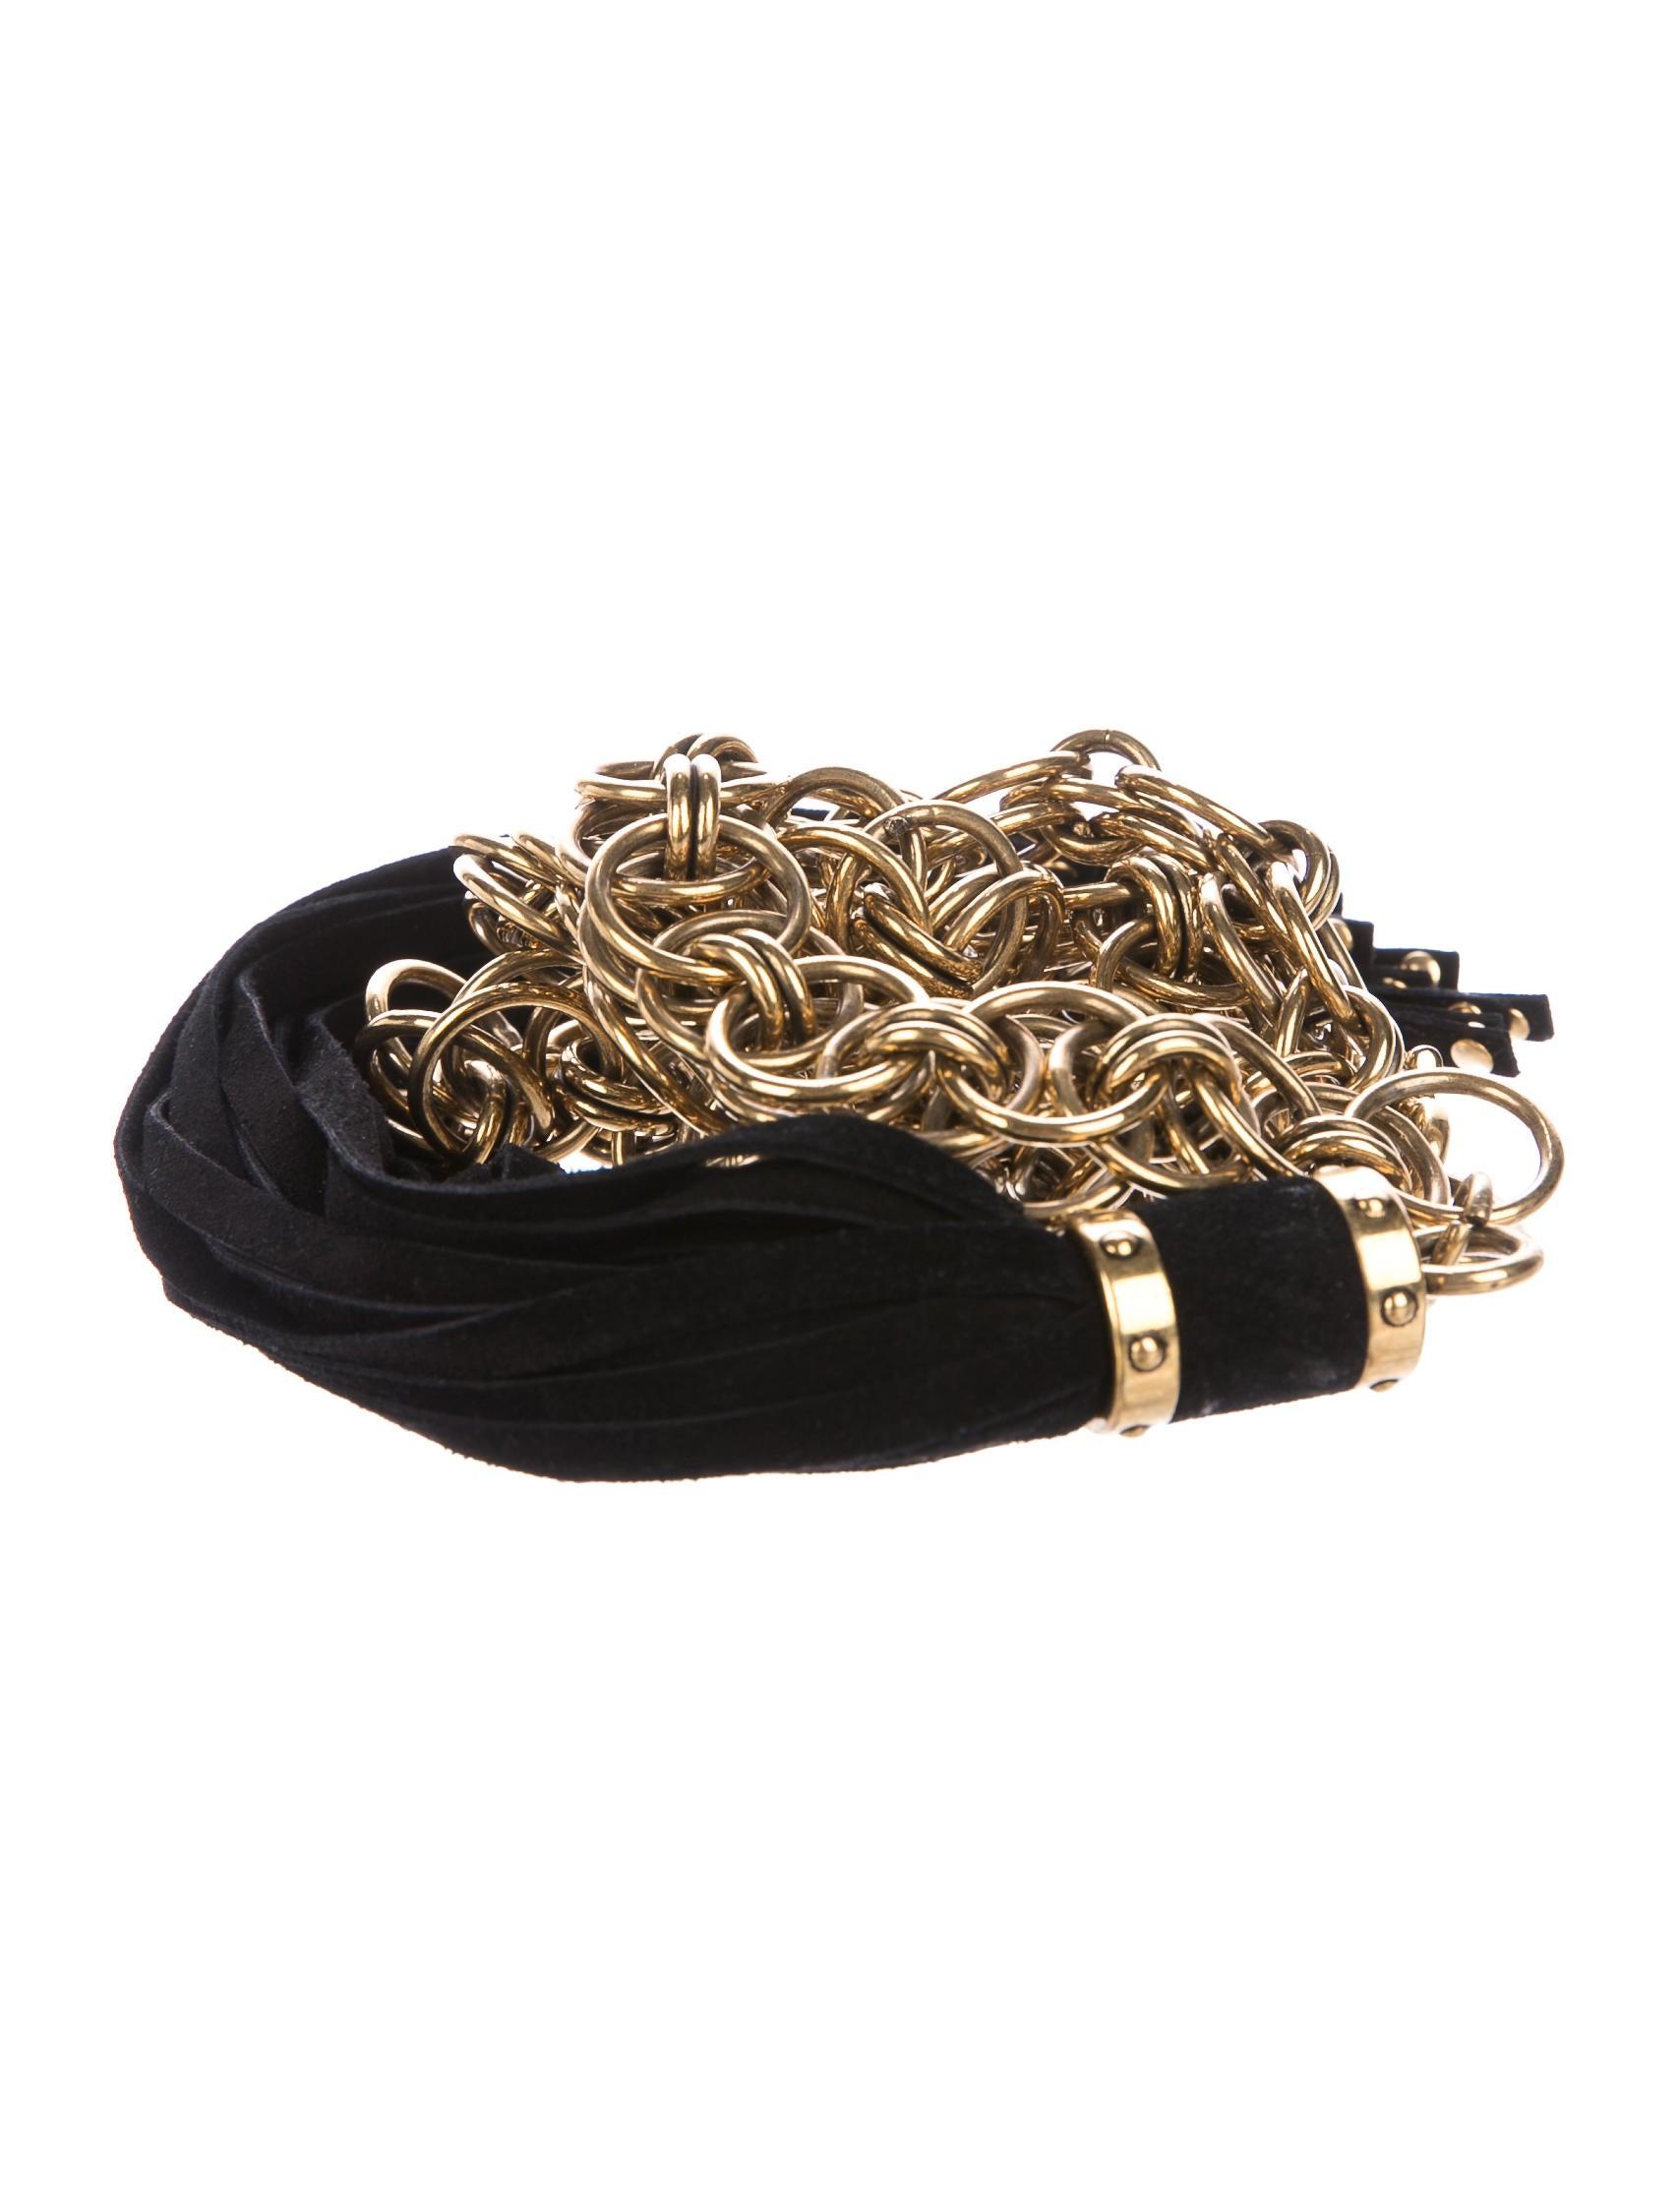 899e37cb8c1 Gucci Chain Tassel Belt - Accessories - GUC191789